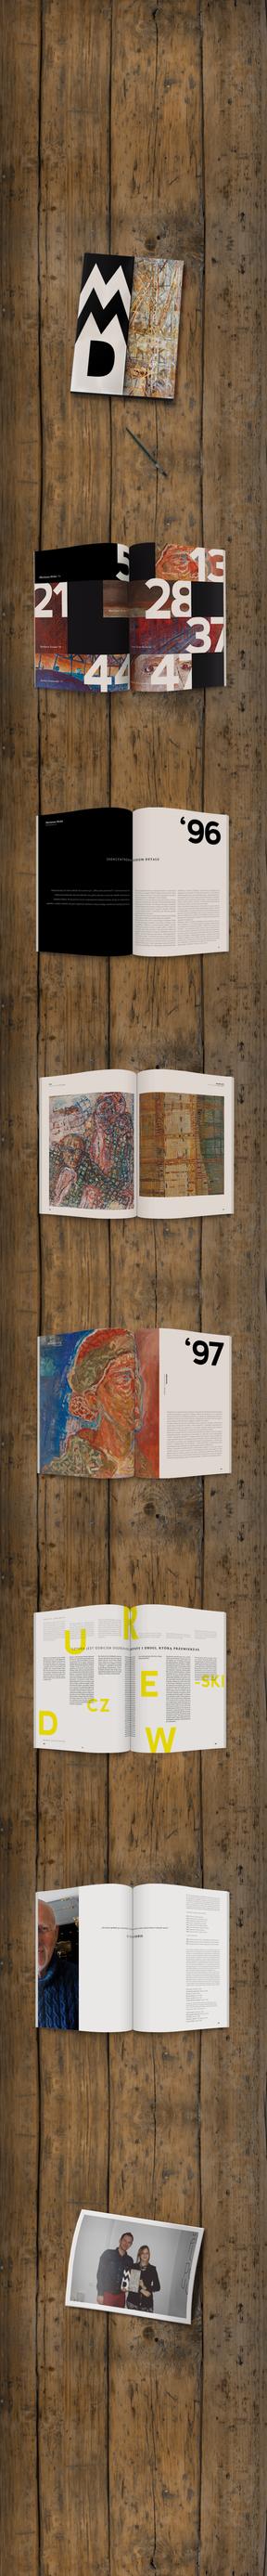 Marek Markus Durczewski book by Bob-Project